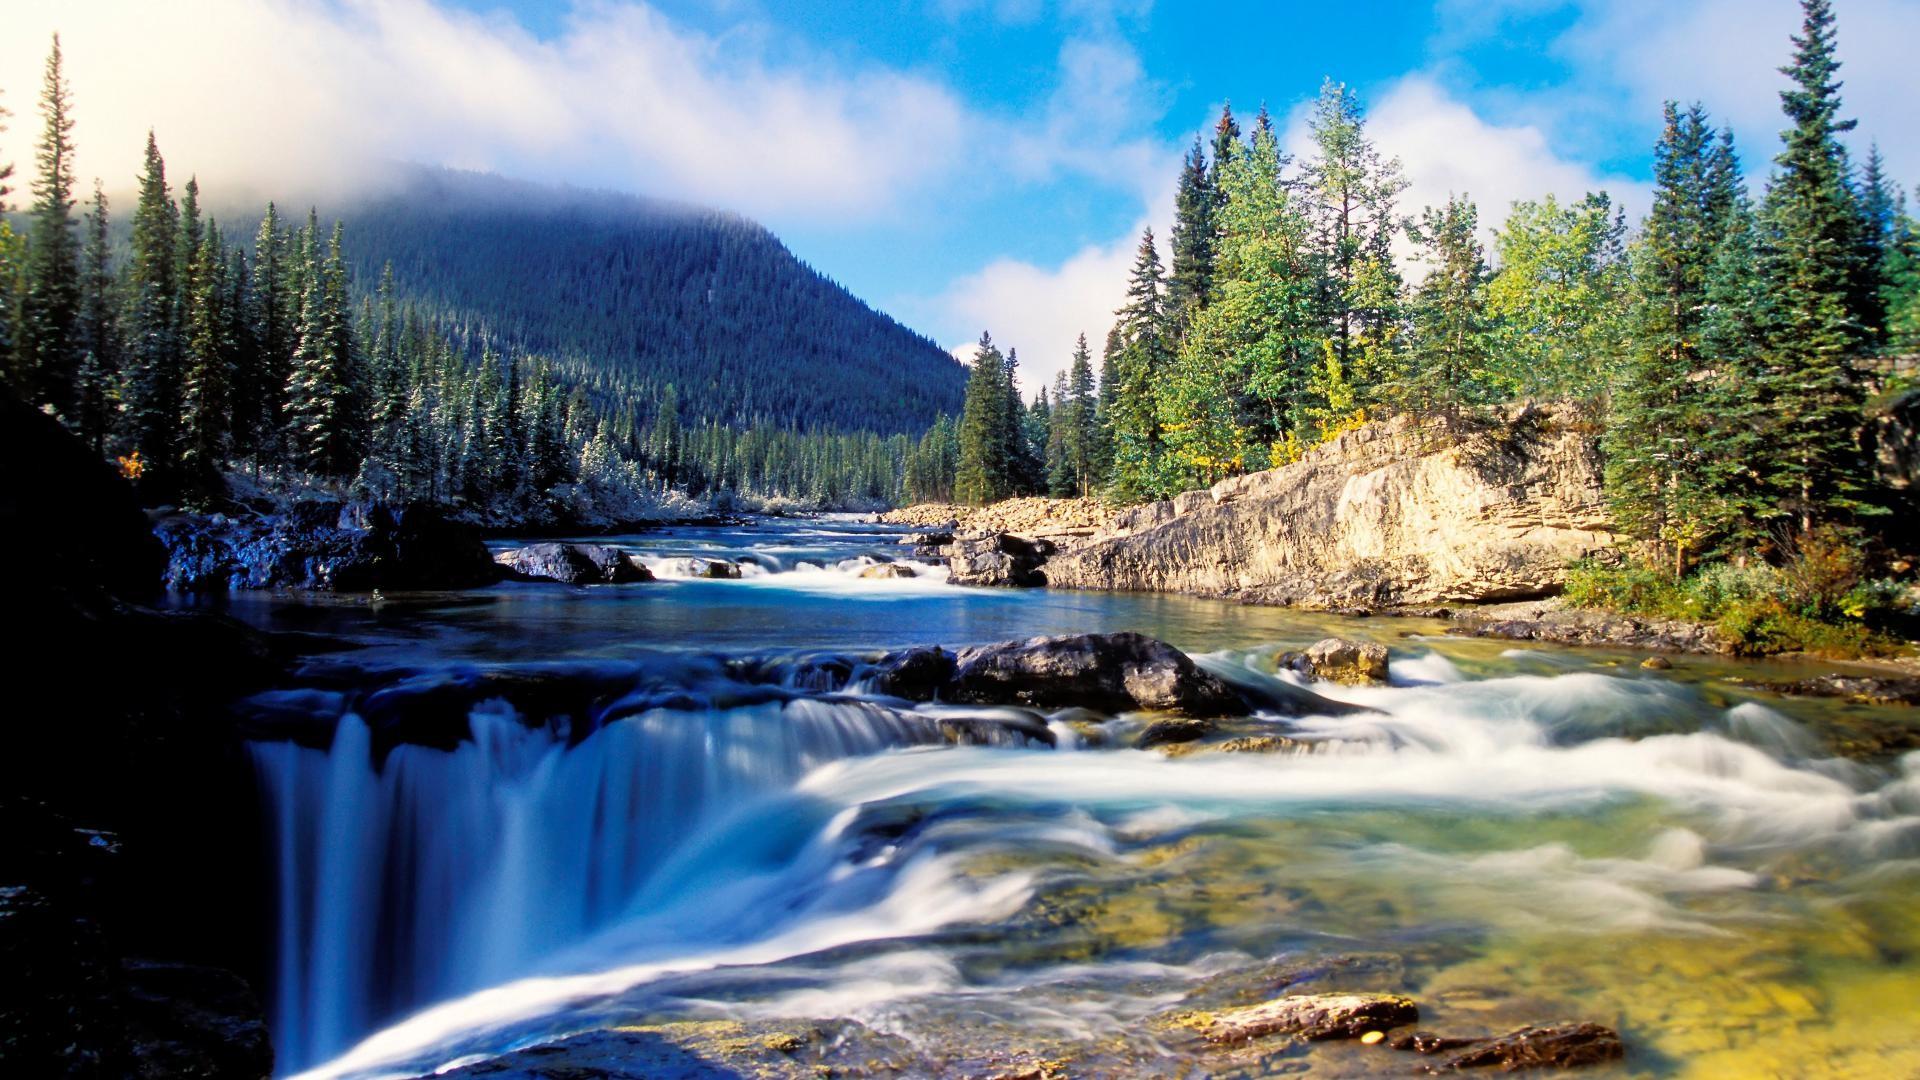 HD Landscape Wallpapers: Find best latest HD Landscape Wallpapers in HD for  your PC desktop